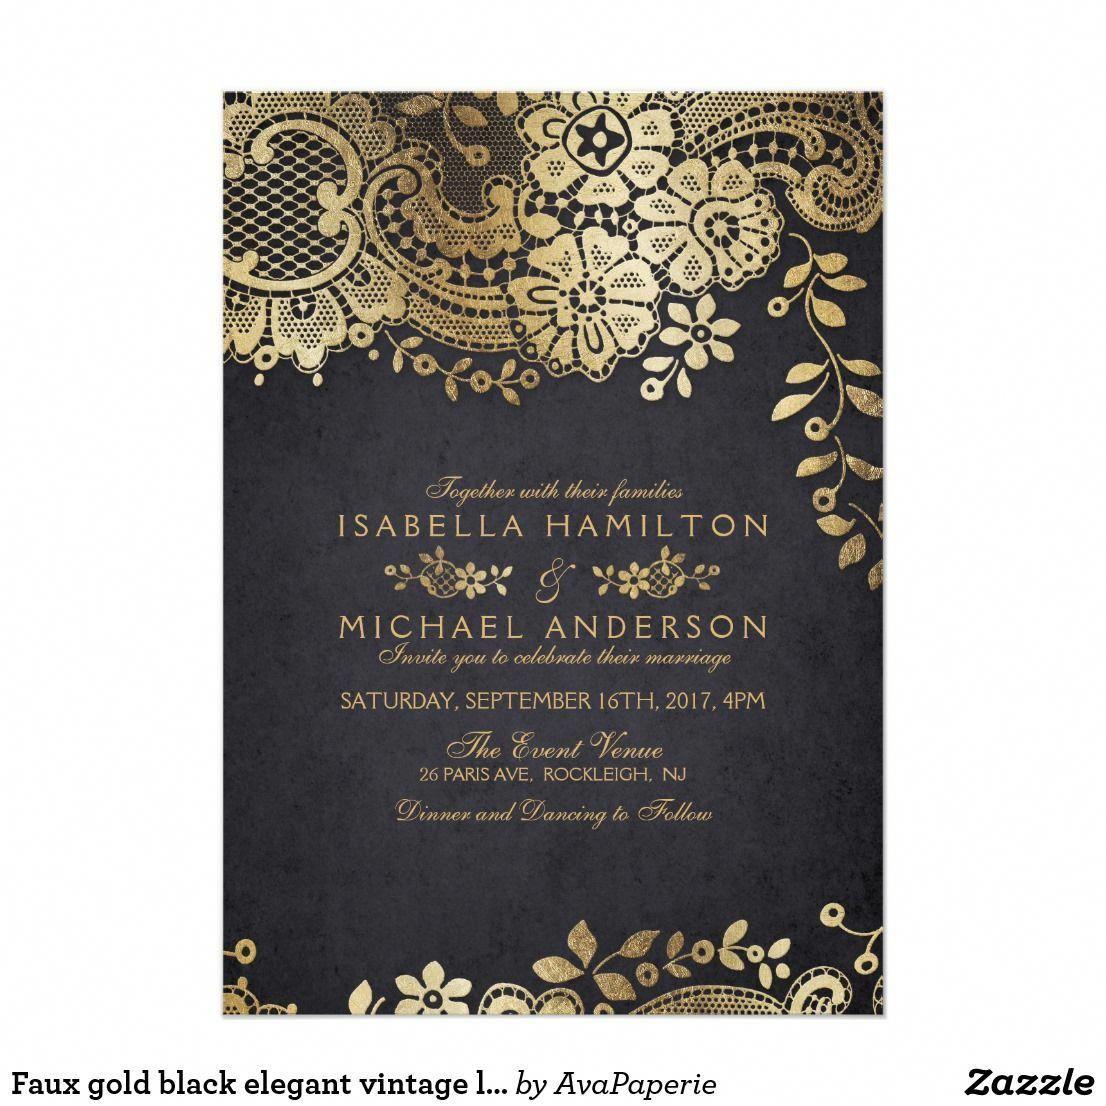 Faux Gold Black Elegant Vintage Lace Wedding Invitation Zazzle Com Vintage Wedding Invitations Lace Lace Wedding Invitations Sparkle Wedding Invitations